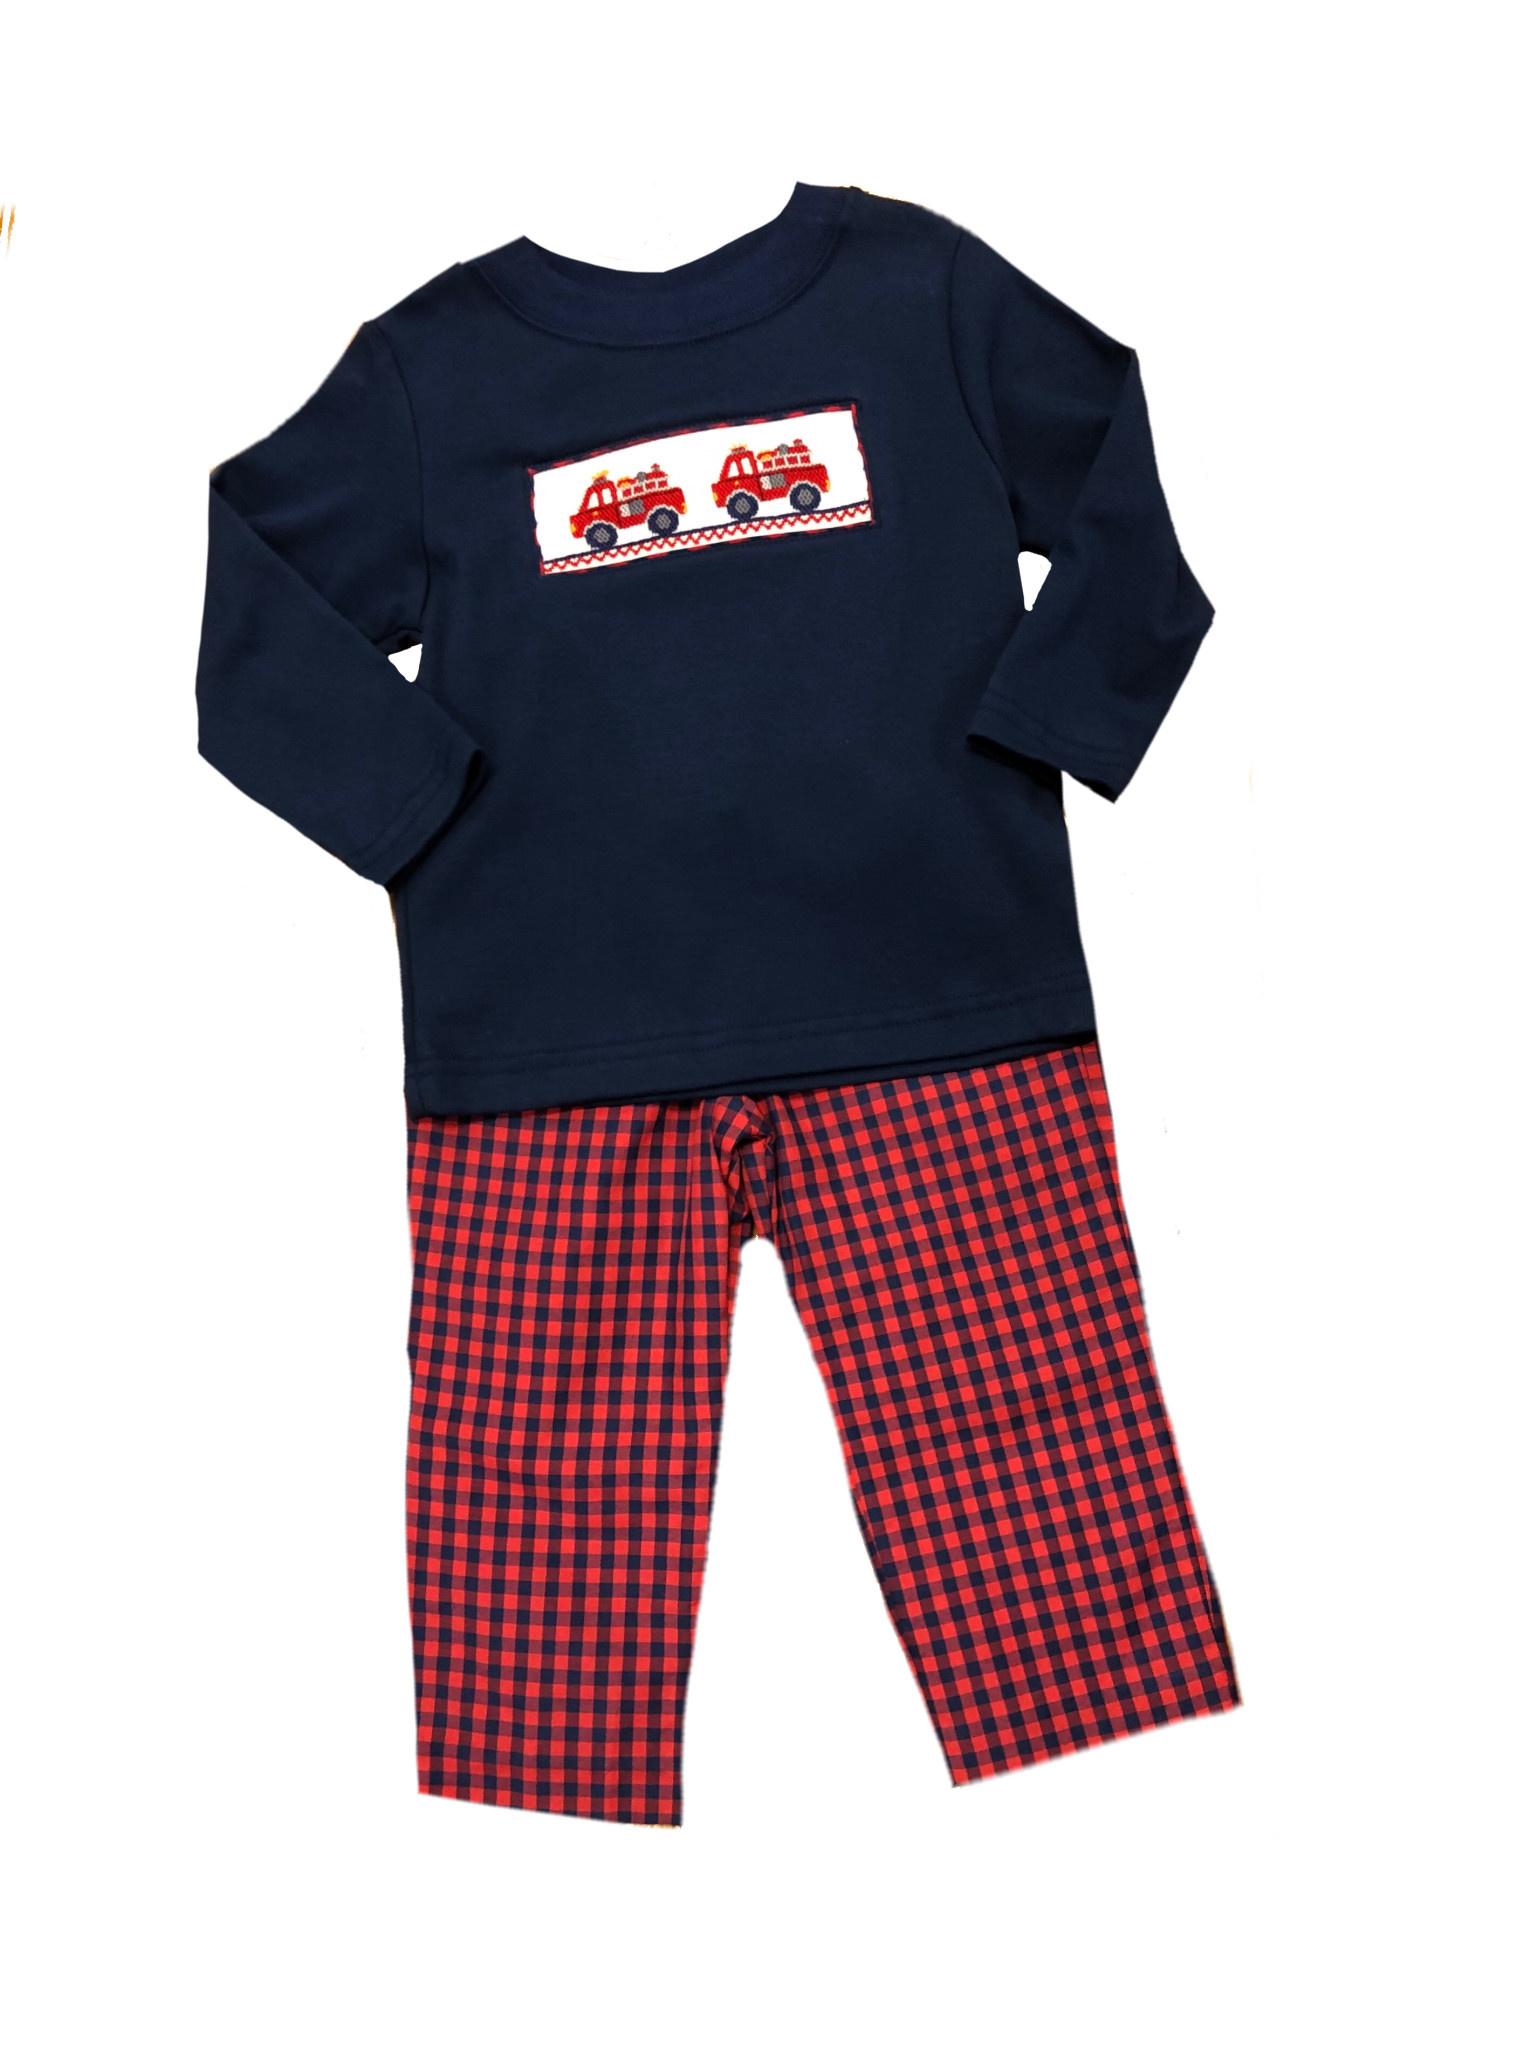 Firetruck Boy's Smocked Shirt & Pant Set - Doodlebugs Children's Finery &  Gifts